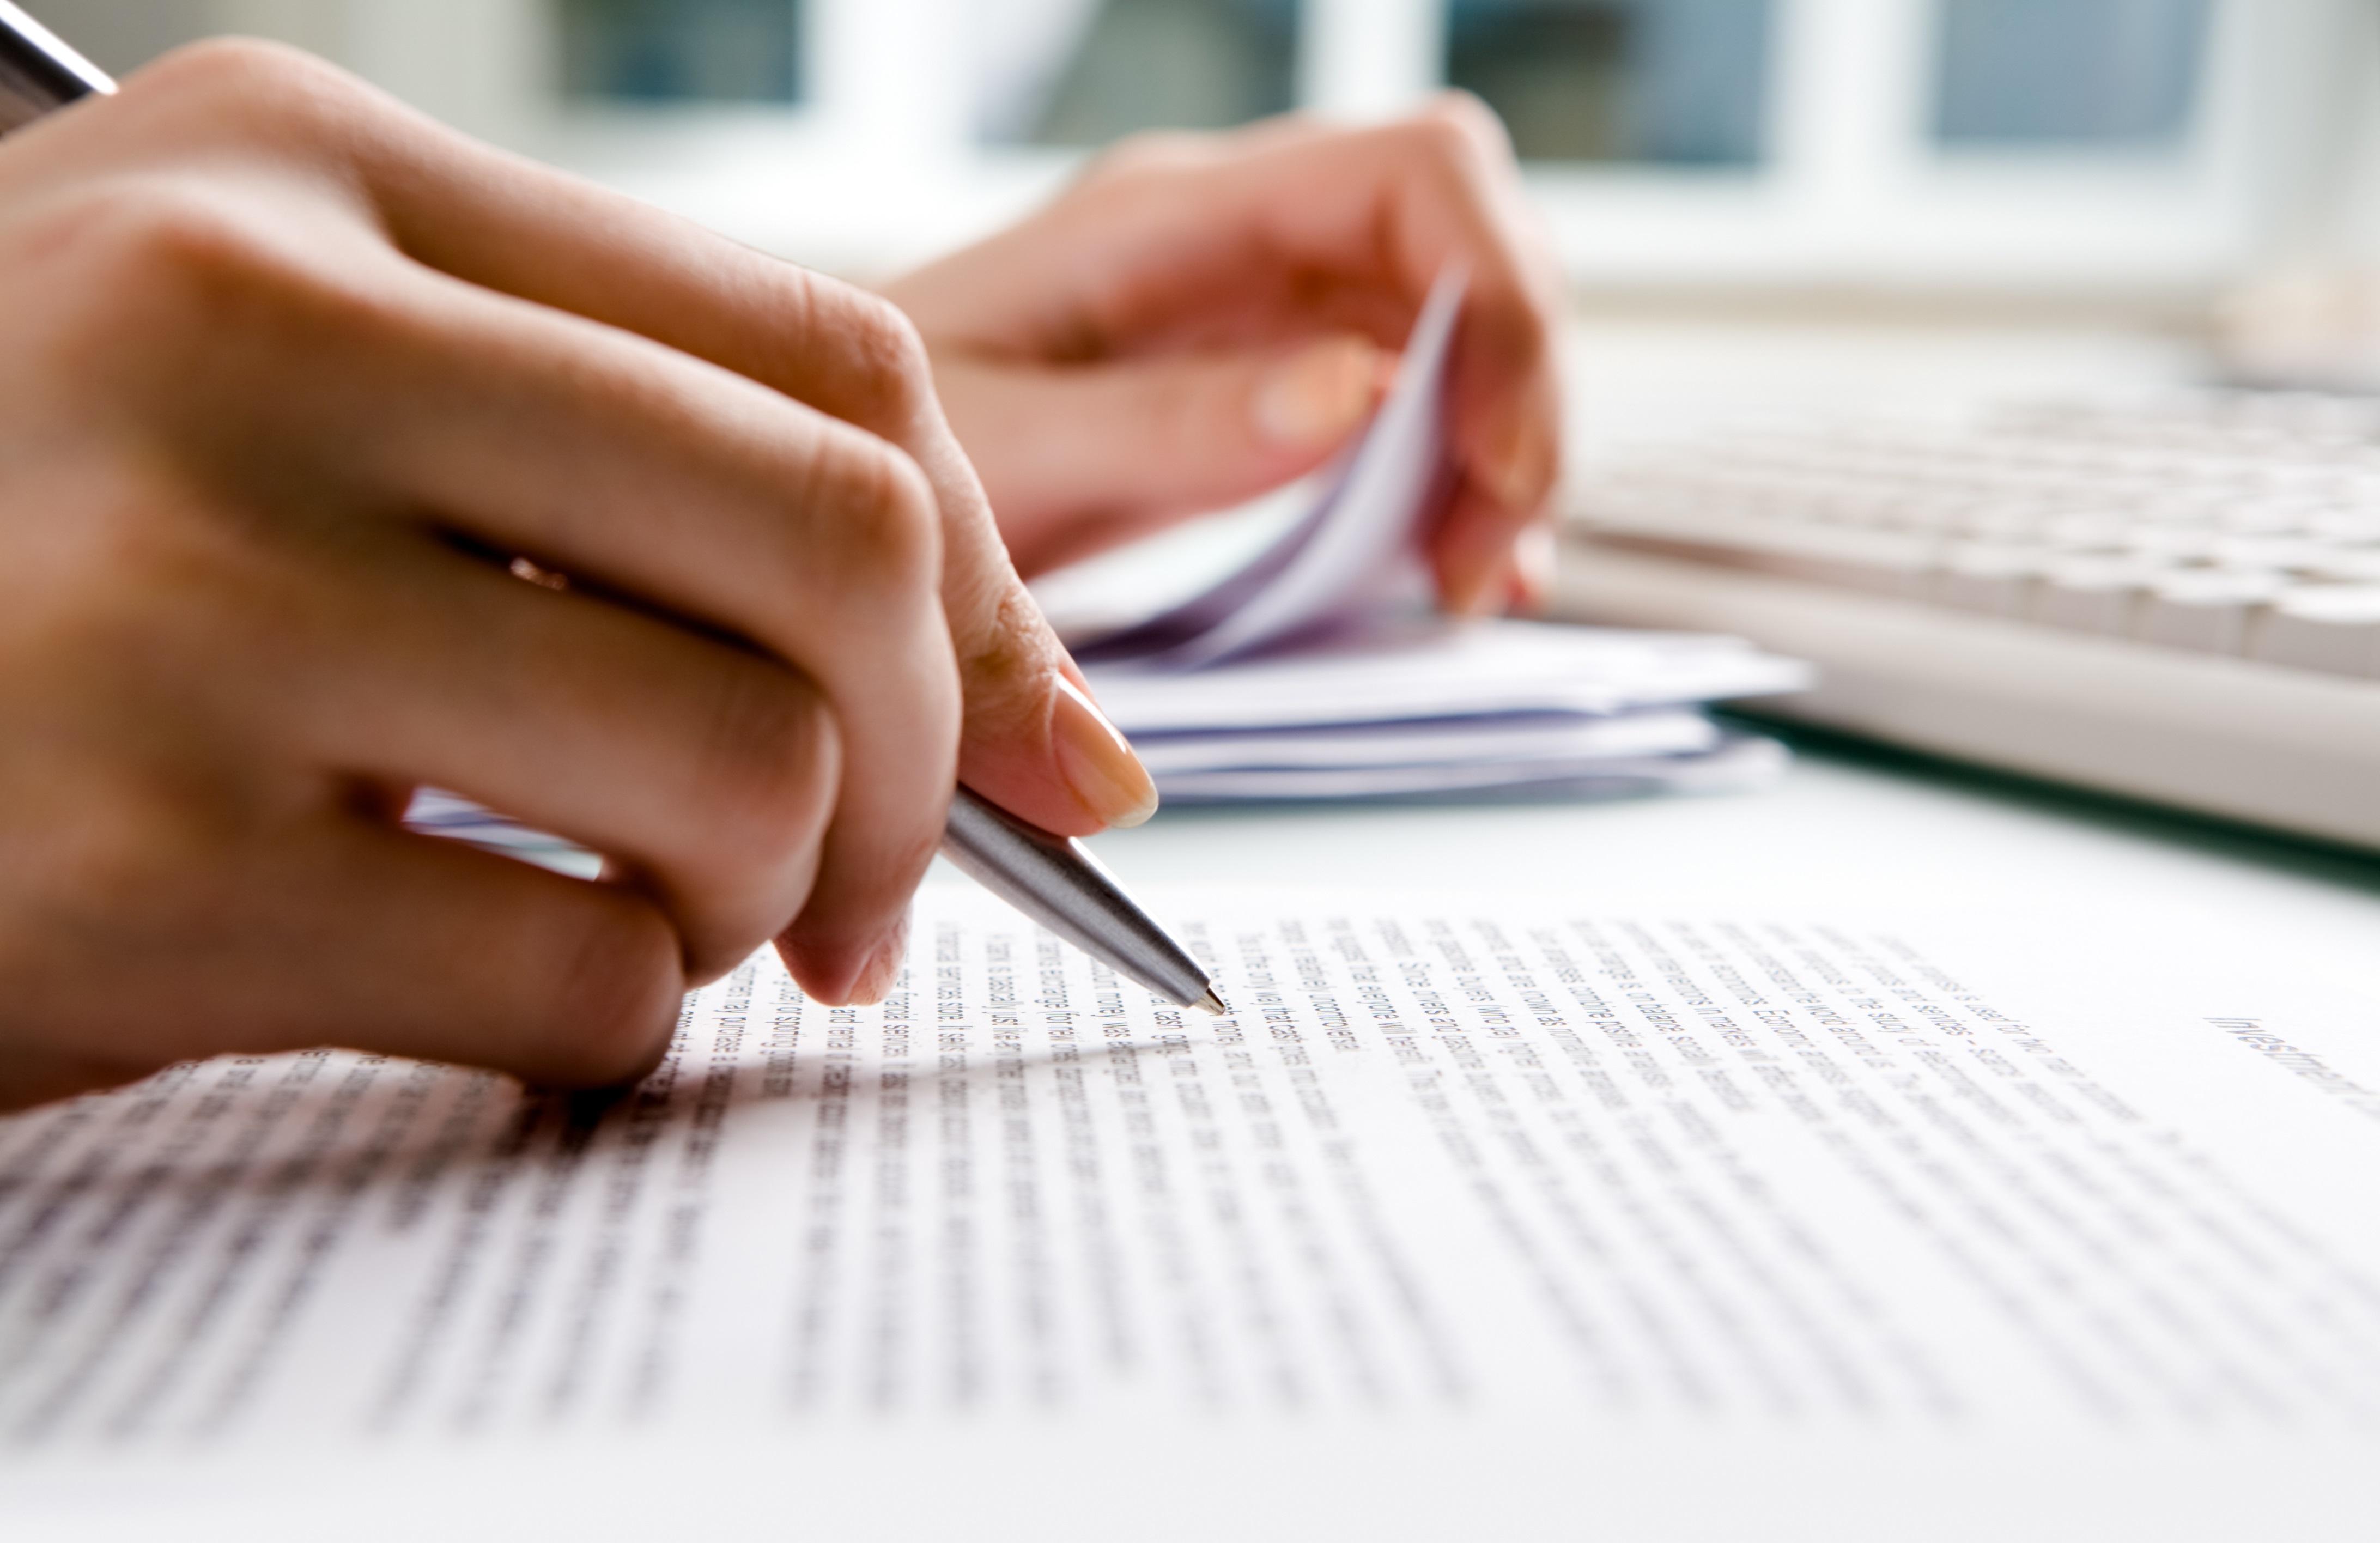 Close-up of secretary's hands doing paperwork